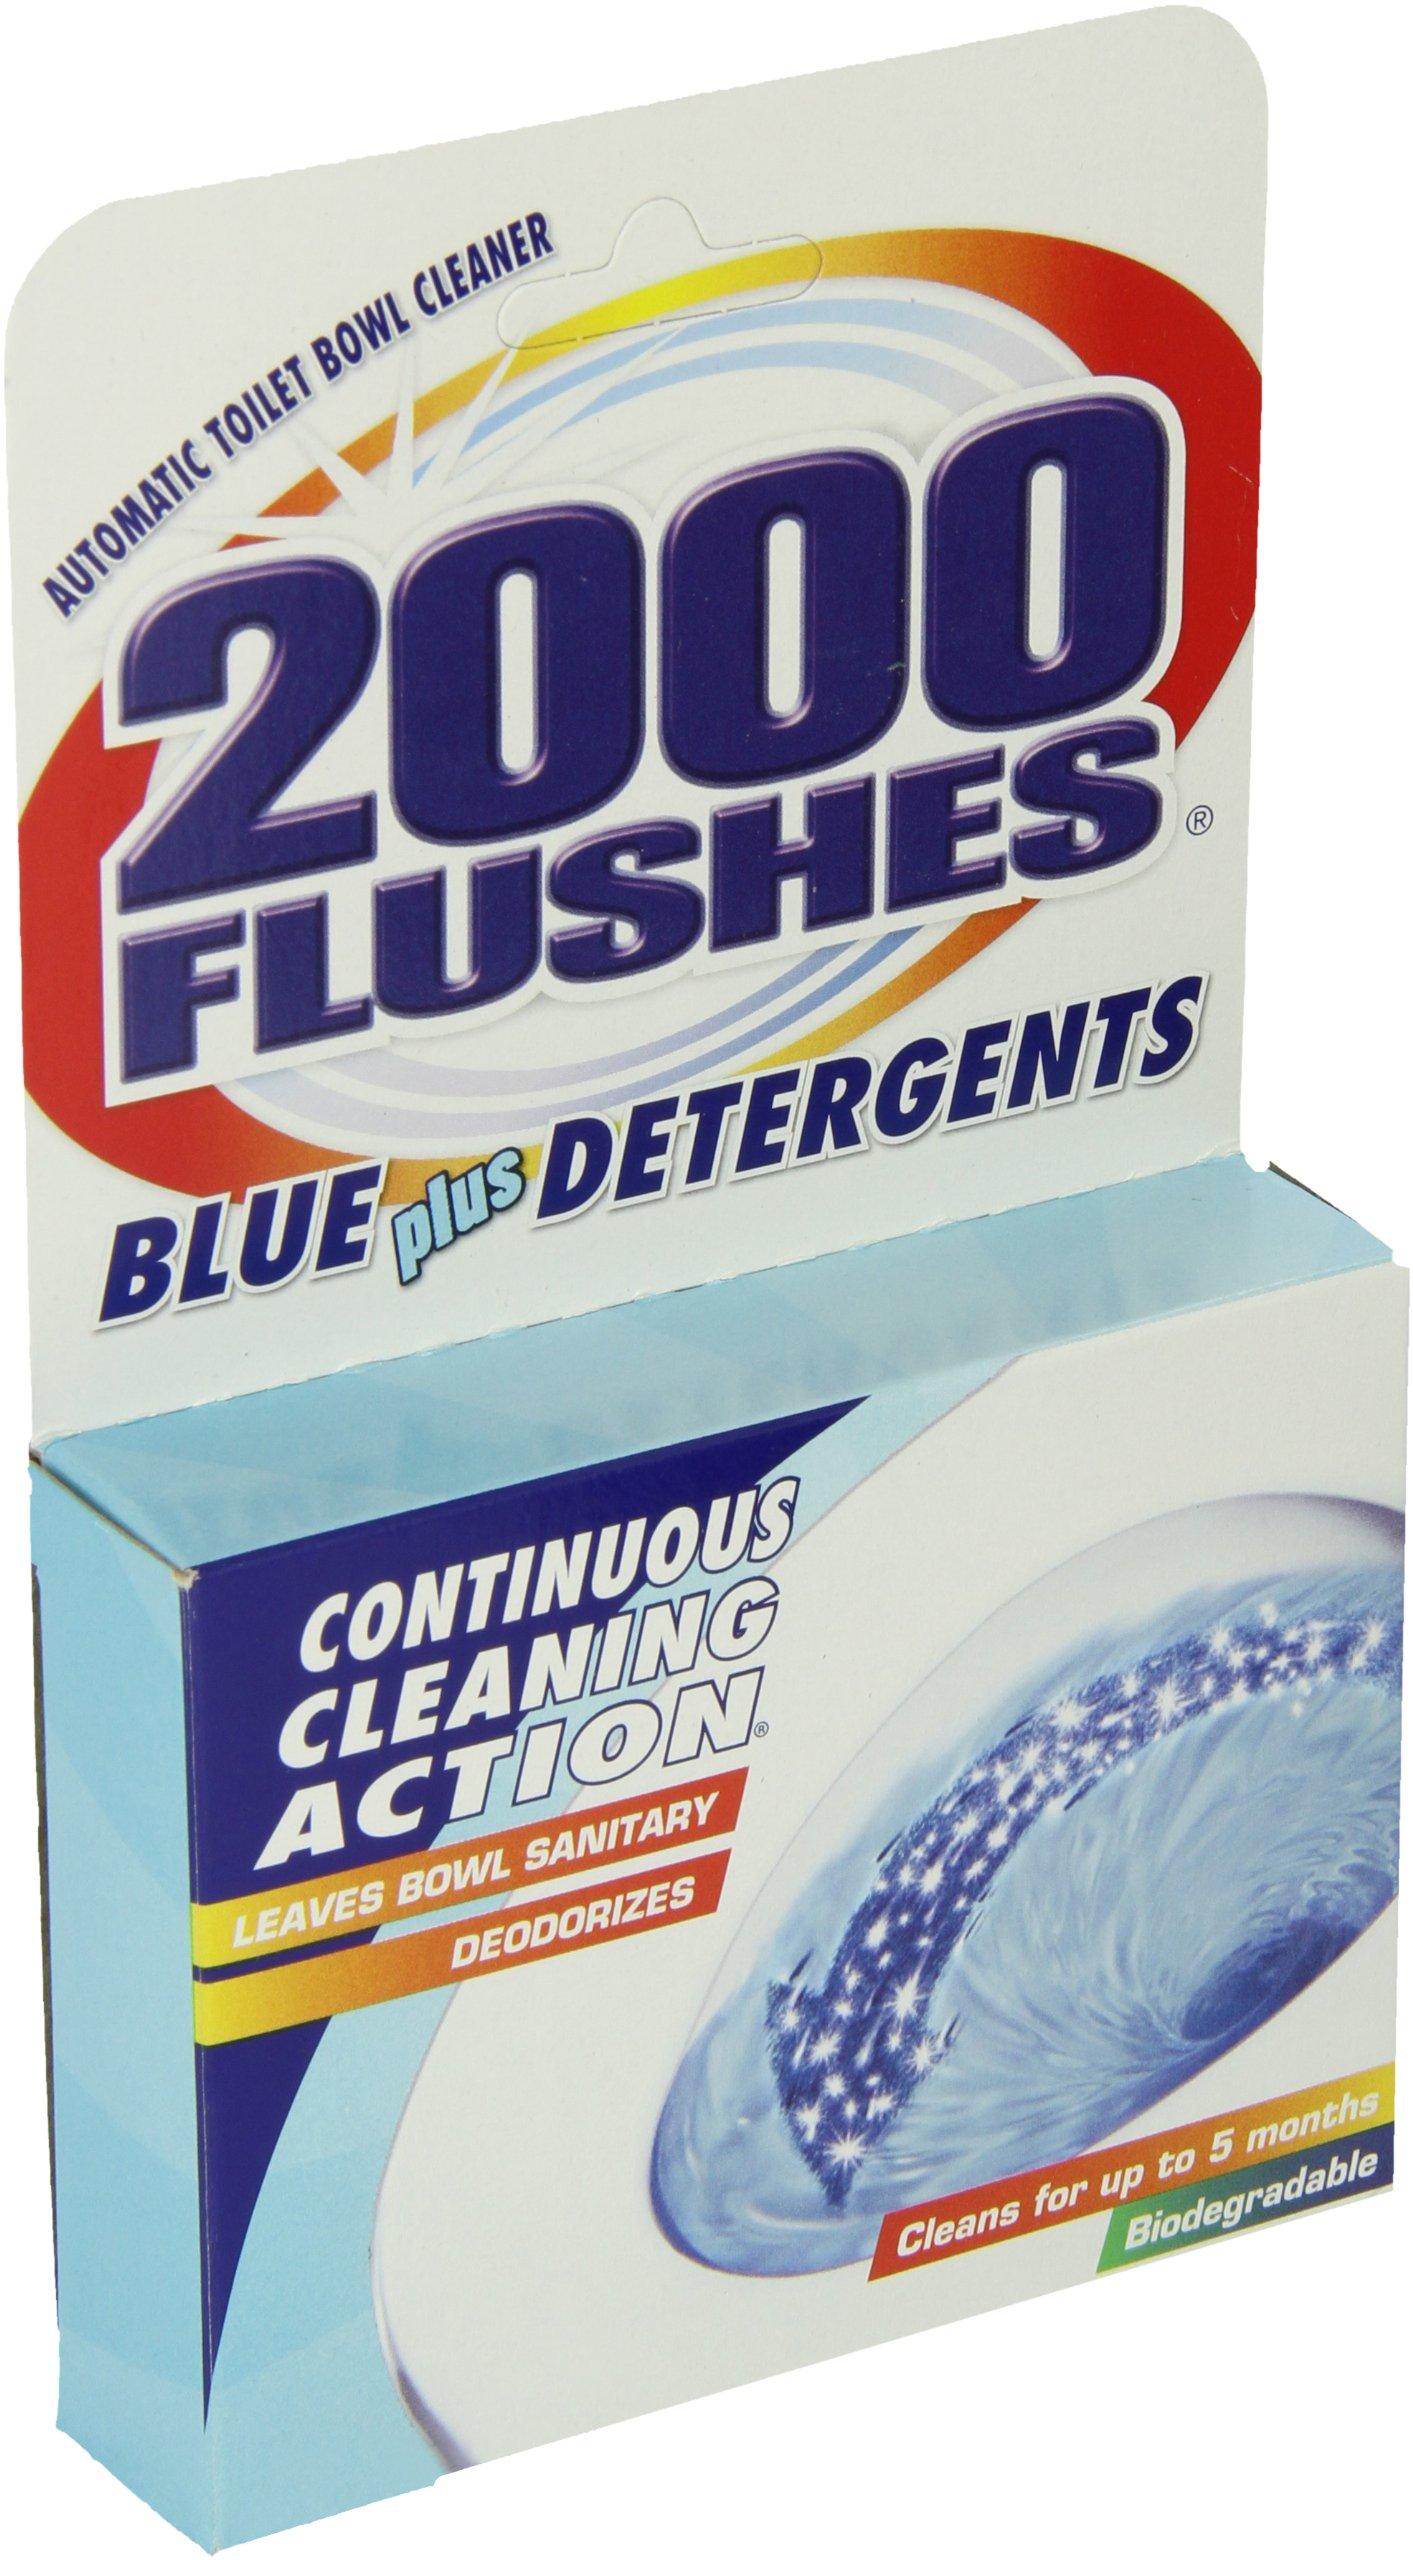 2000FlushesBluePlus Detergents Automatic Toilet Bowl Cleaner, 3.5 OZ